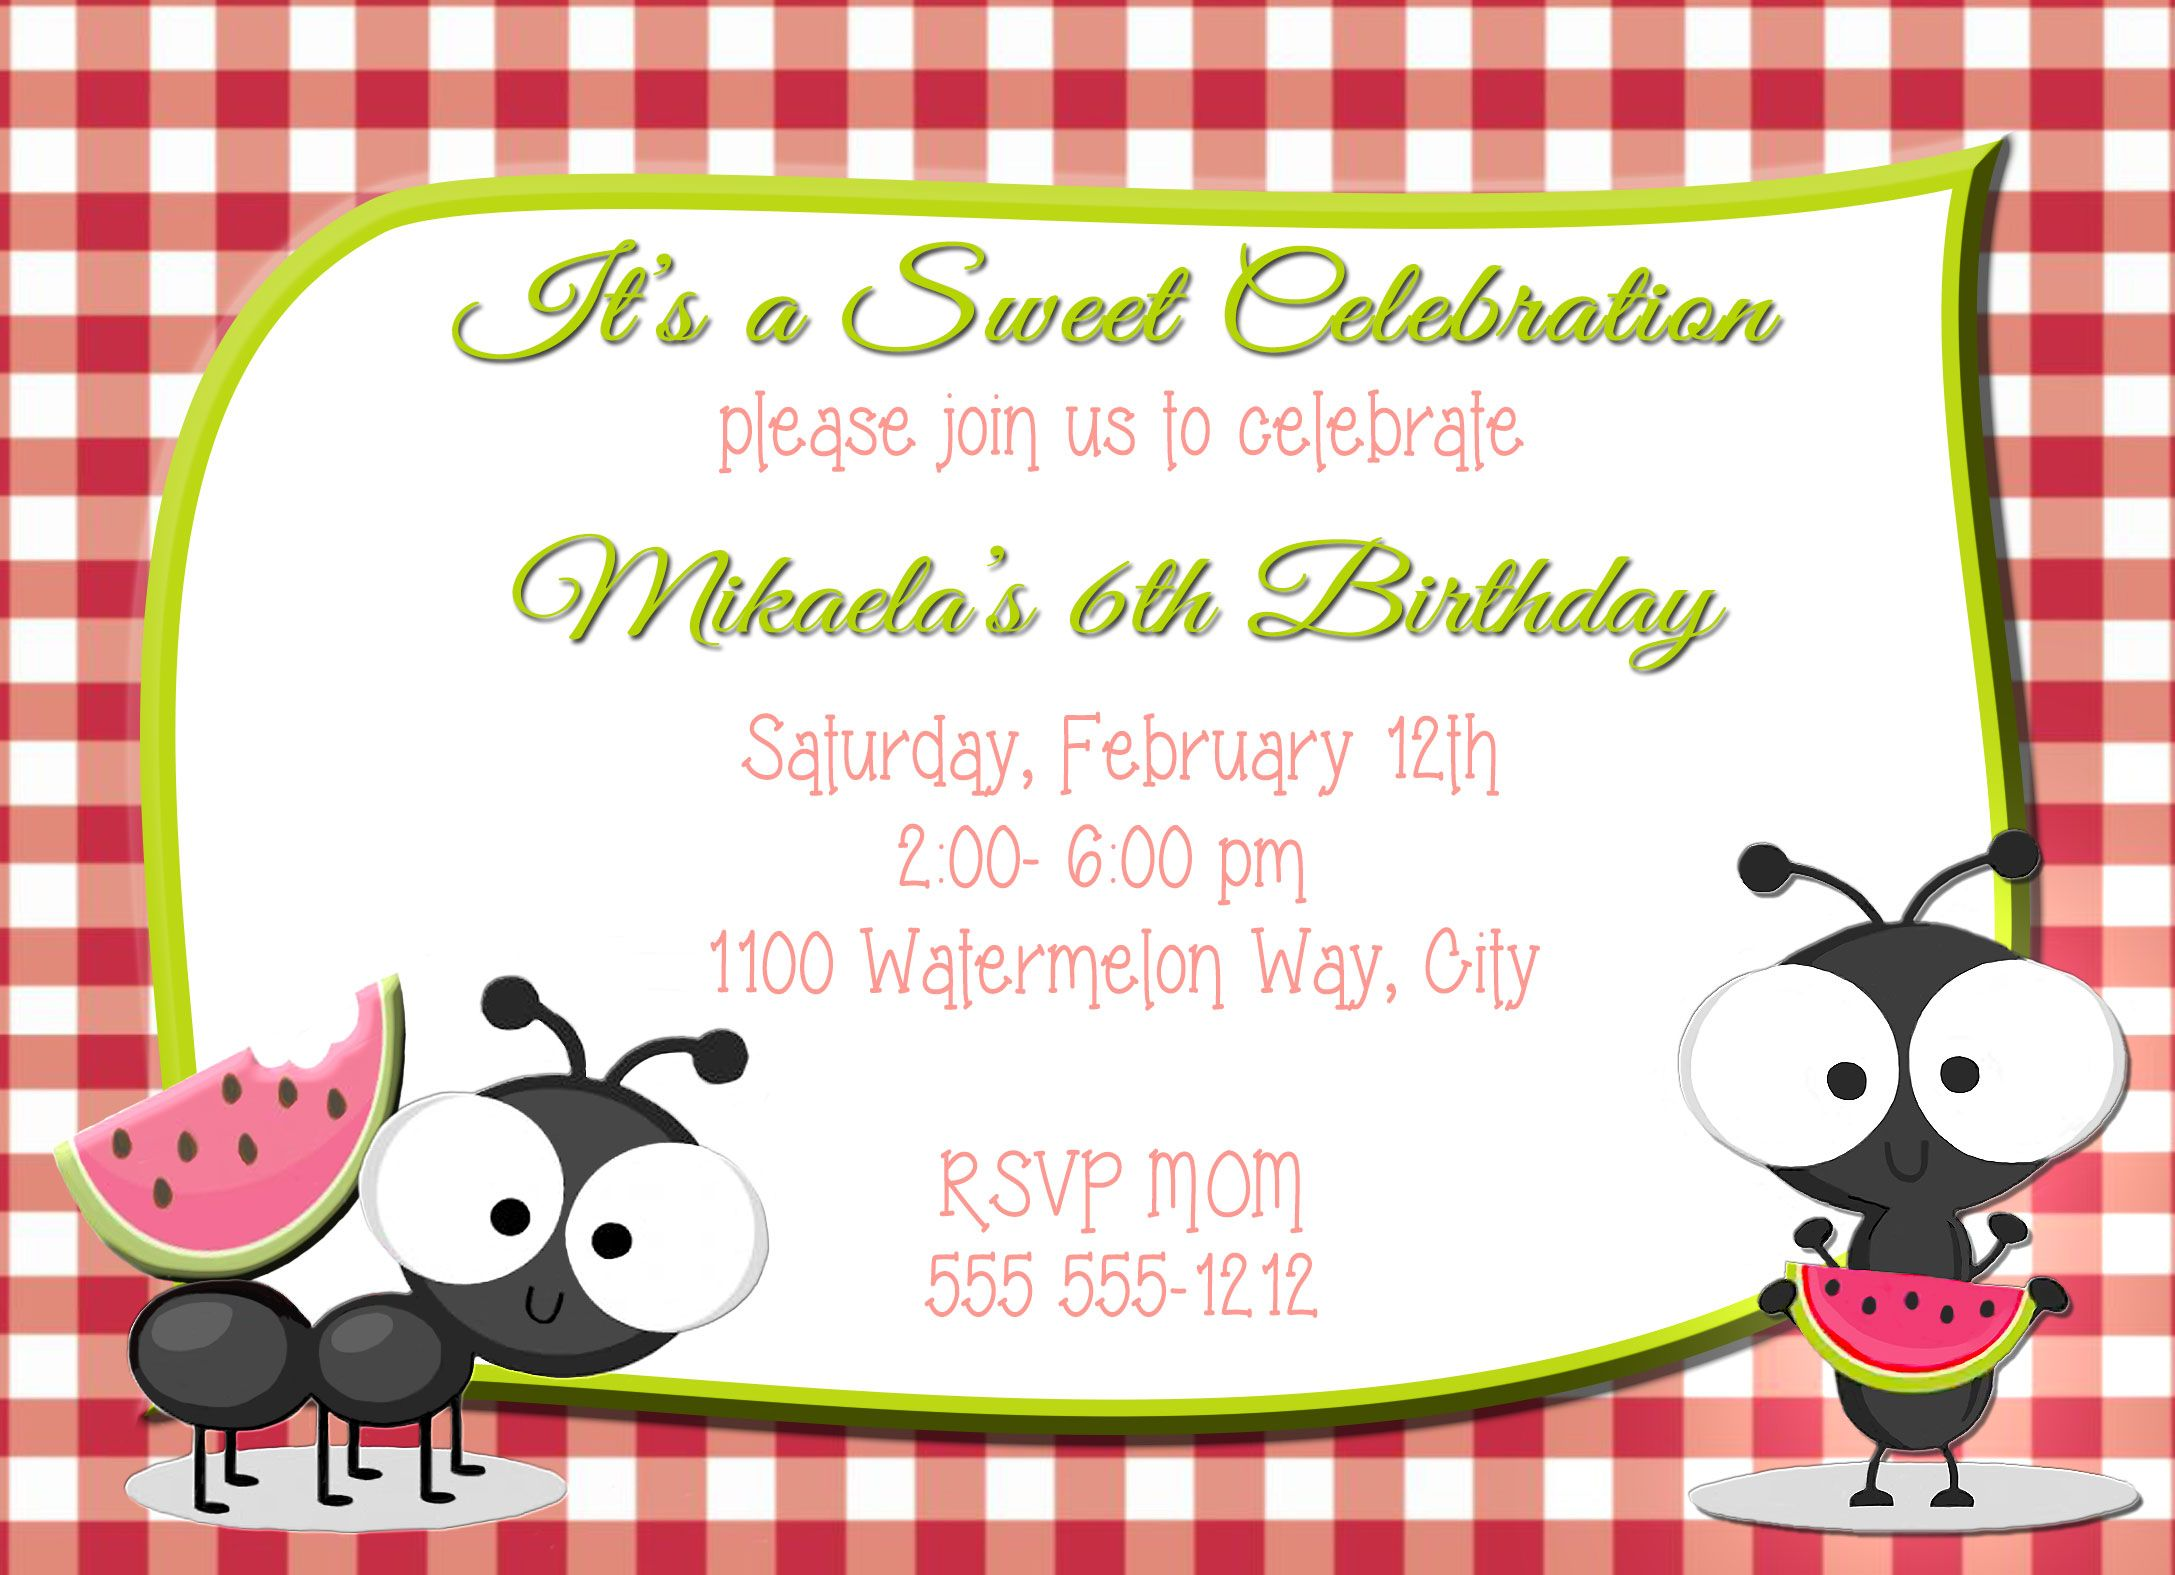 Watermelon picnic personalized birthday invitation 1 sided all watermelon picnic personalized birthday invitation 1 sided filmwisefo Image collections